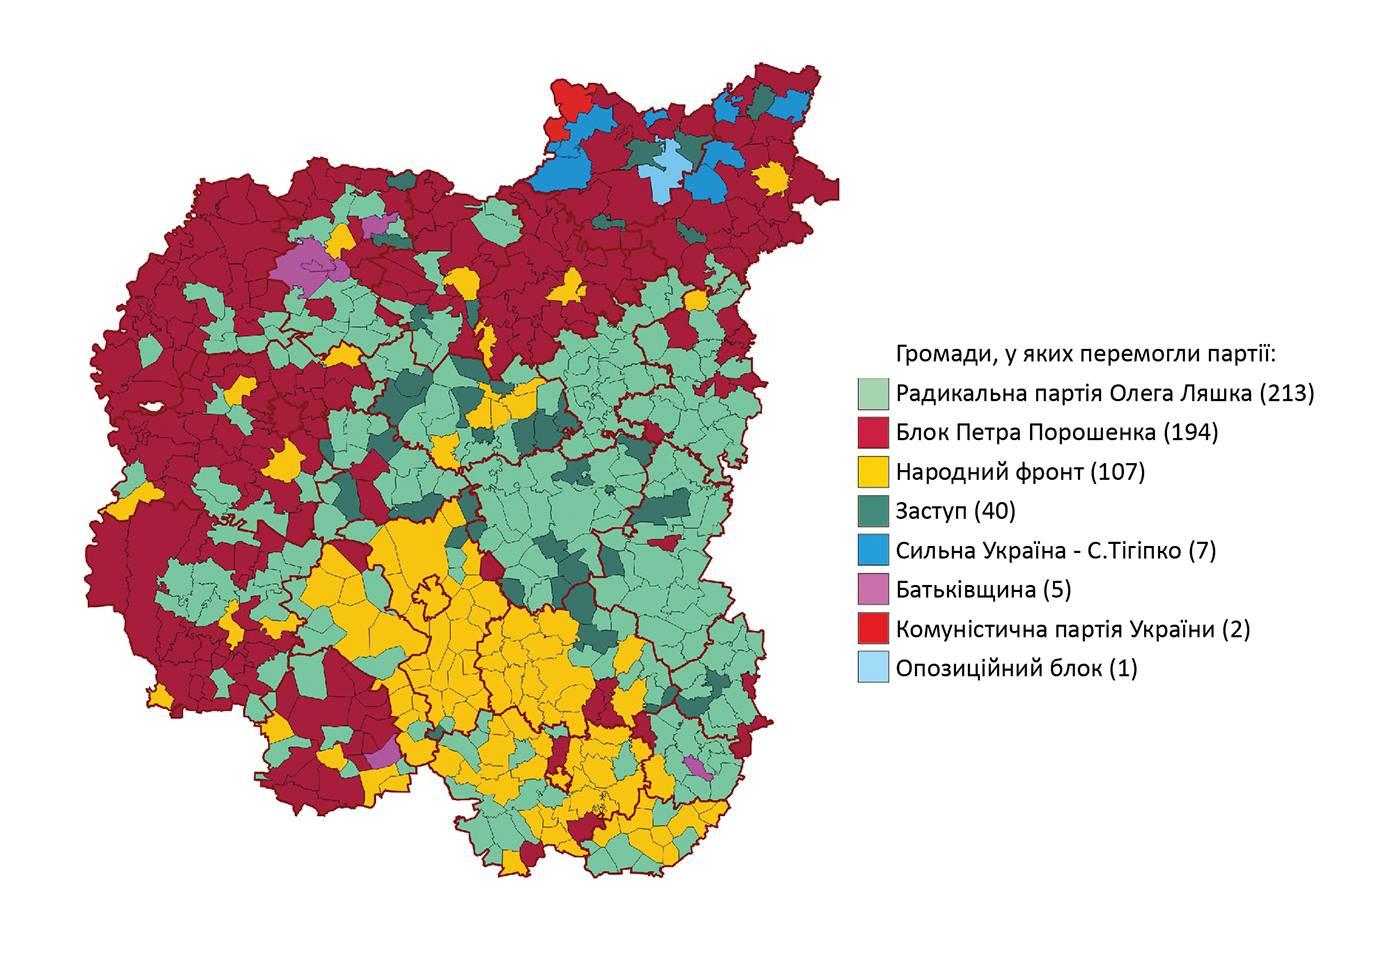 Chernigiv_2014_Parliament_Ukr